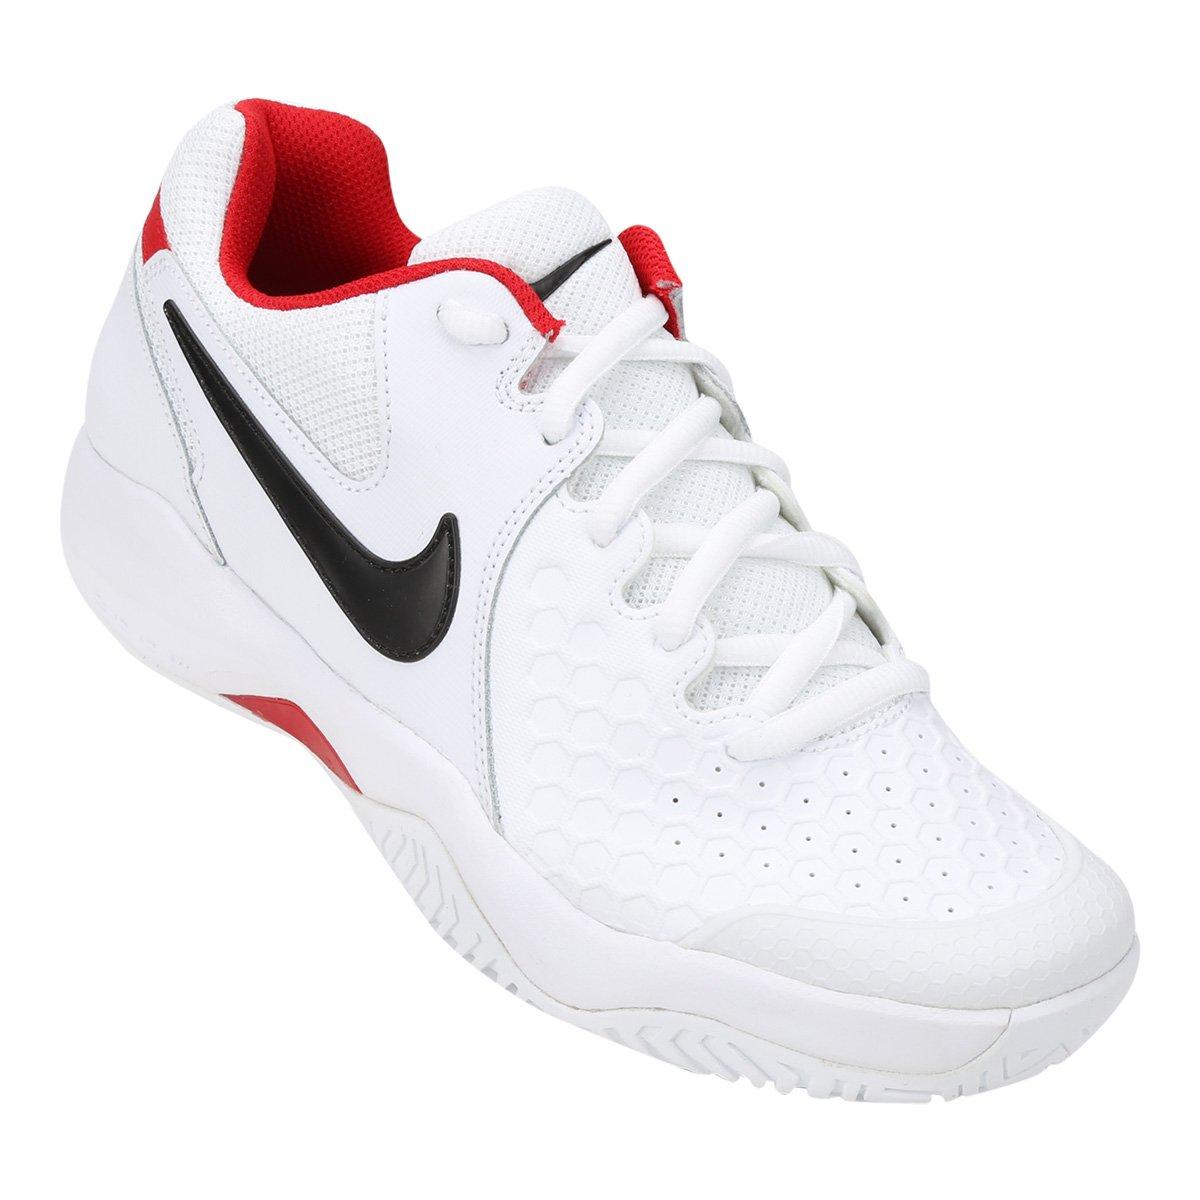 Tenis Nike Air Zoom Branco e Vermelho